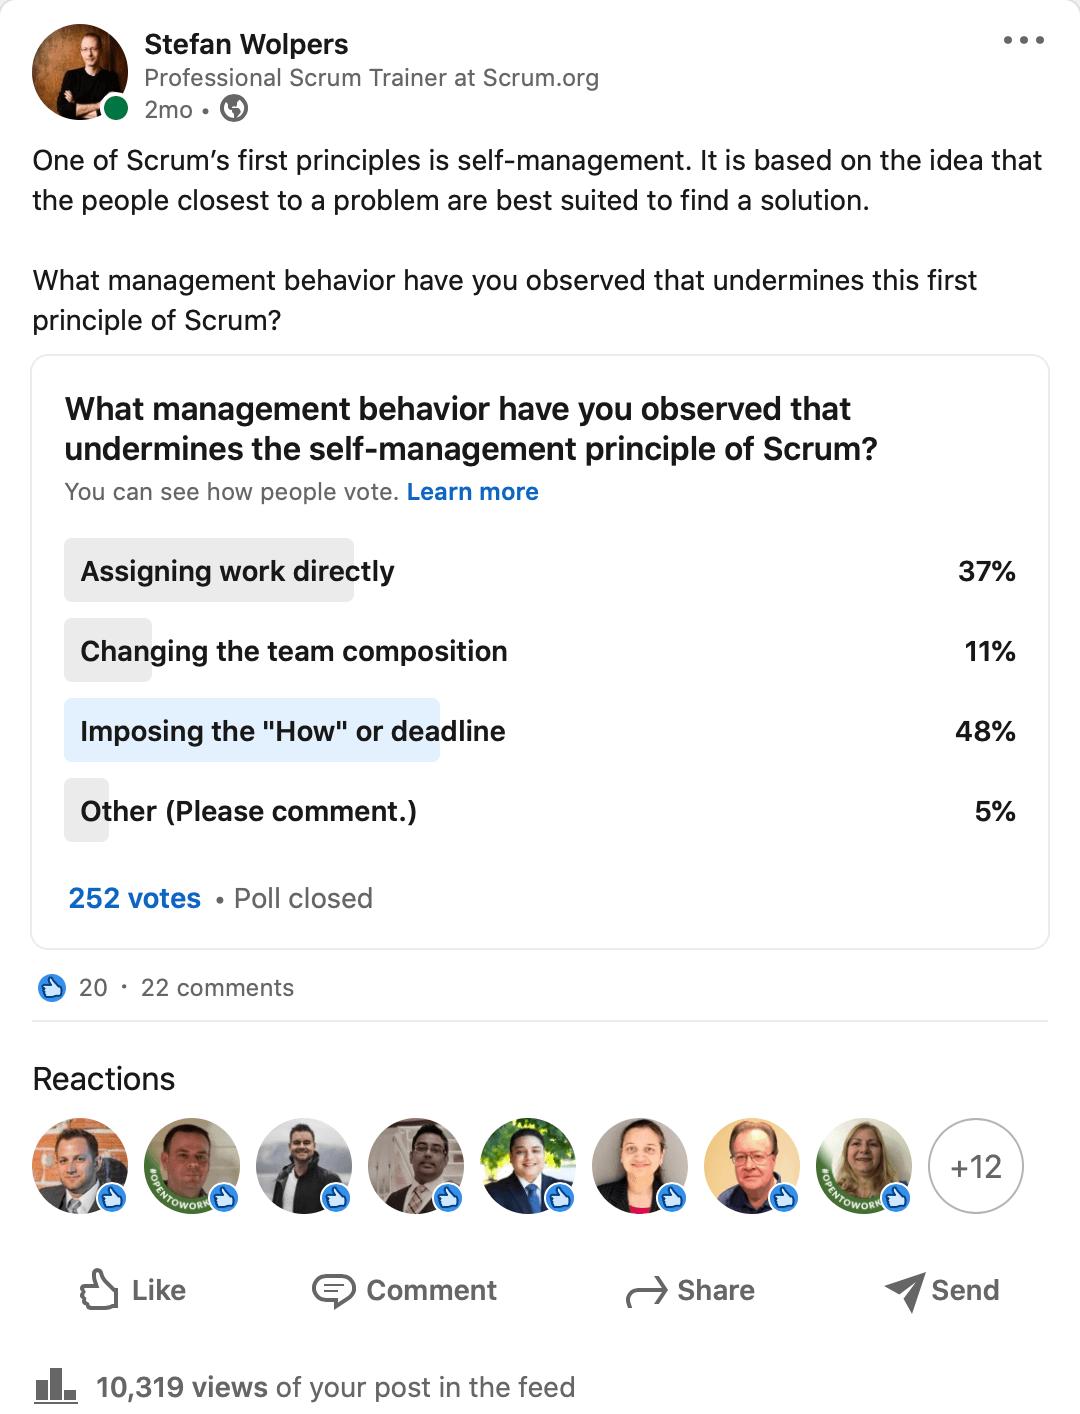 Management Anti-Patterns